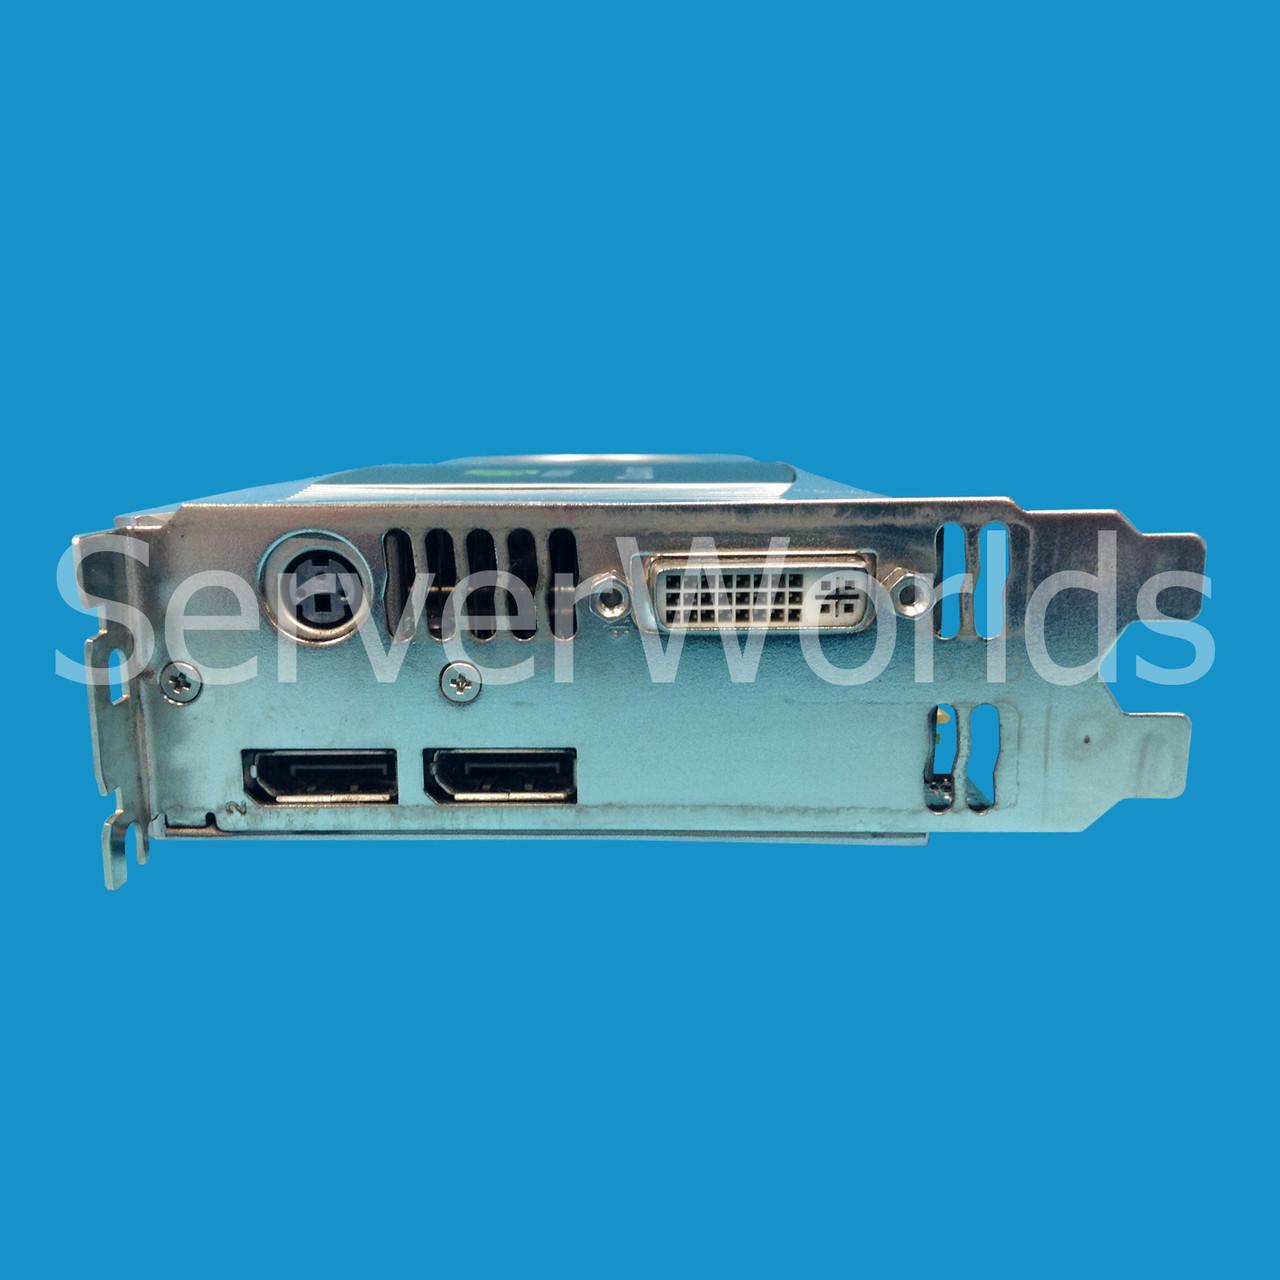 nVidia Quadro FX 4800 Graphics Video Card 536796-001 490566-003